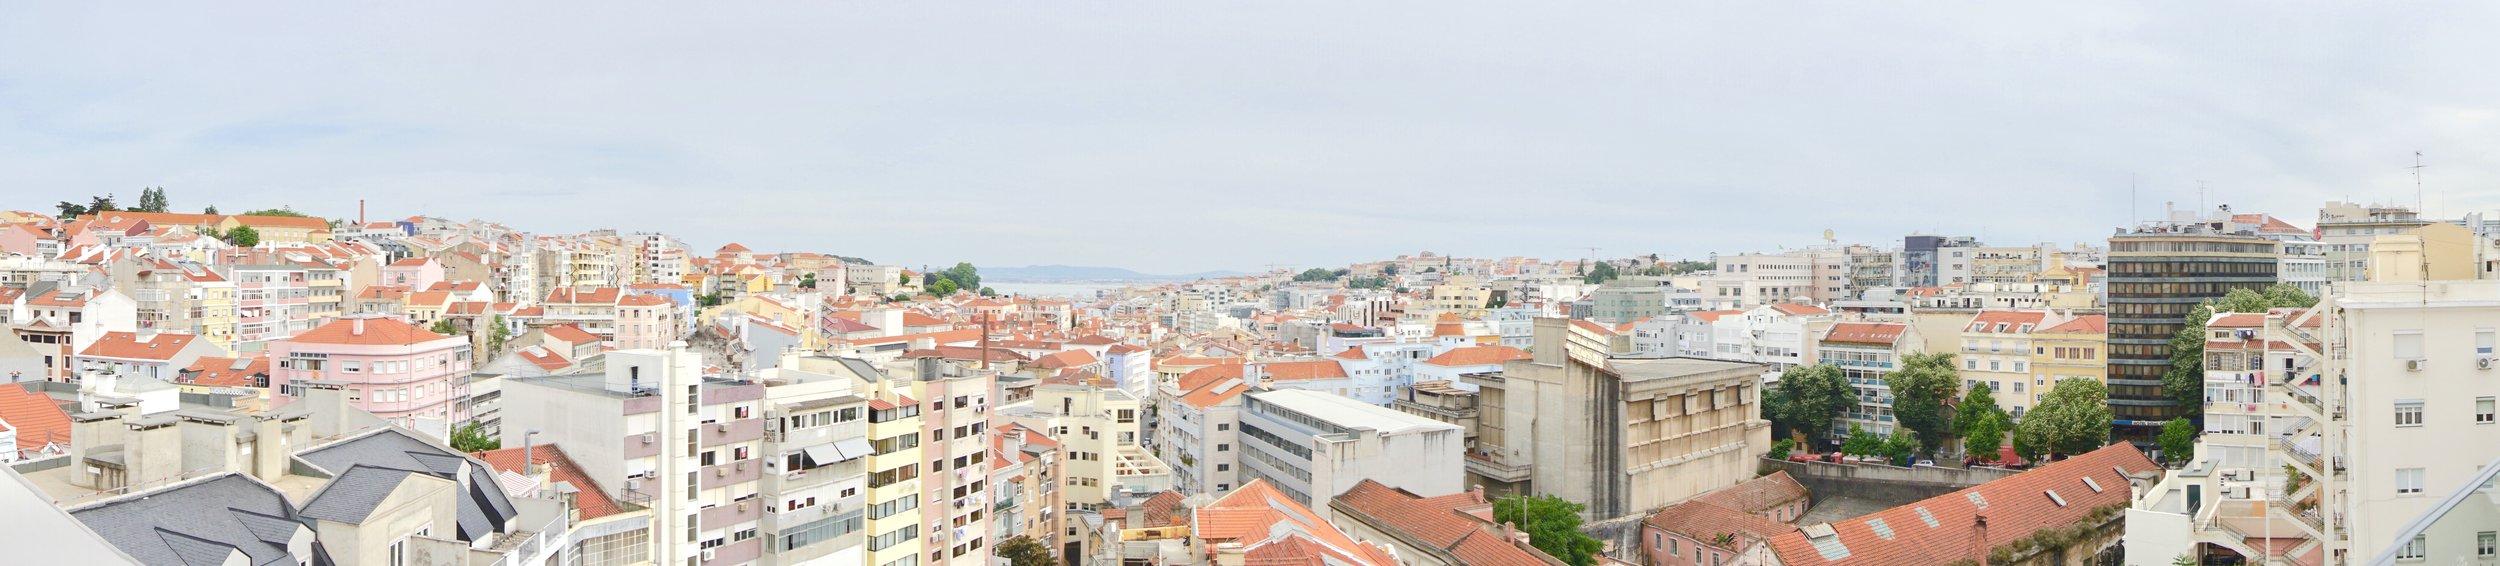 Lisbon-Rooftop-View